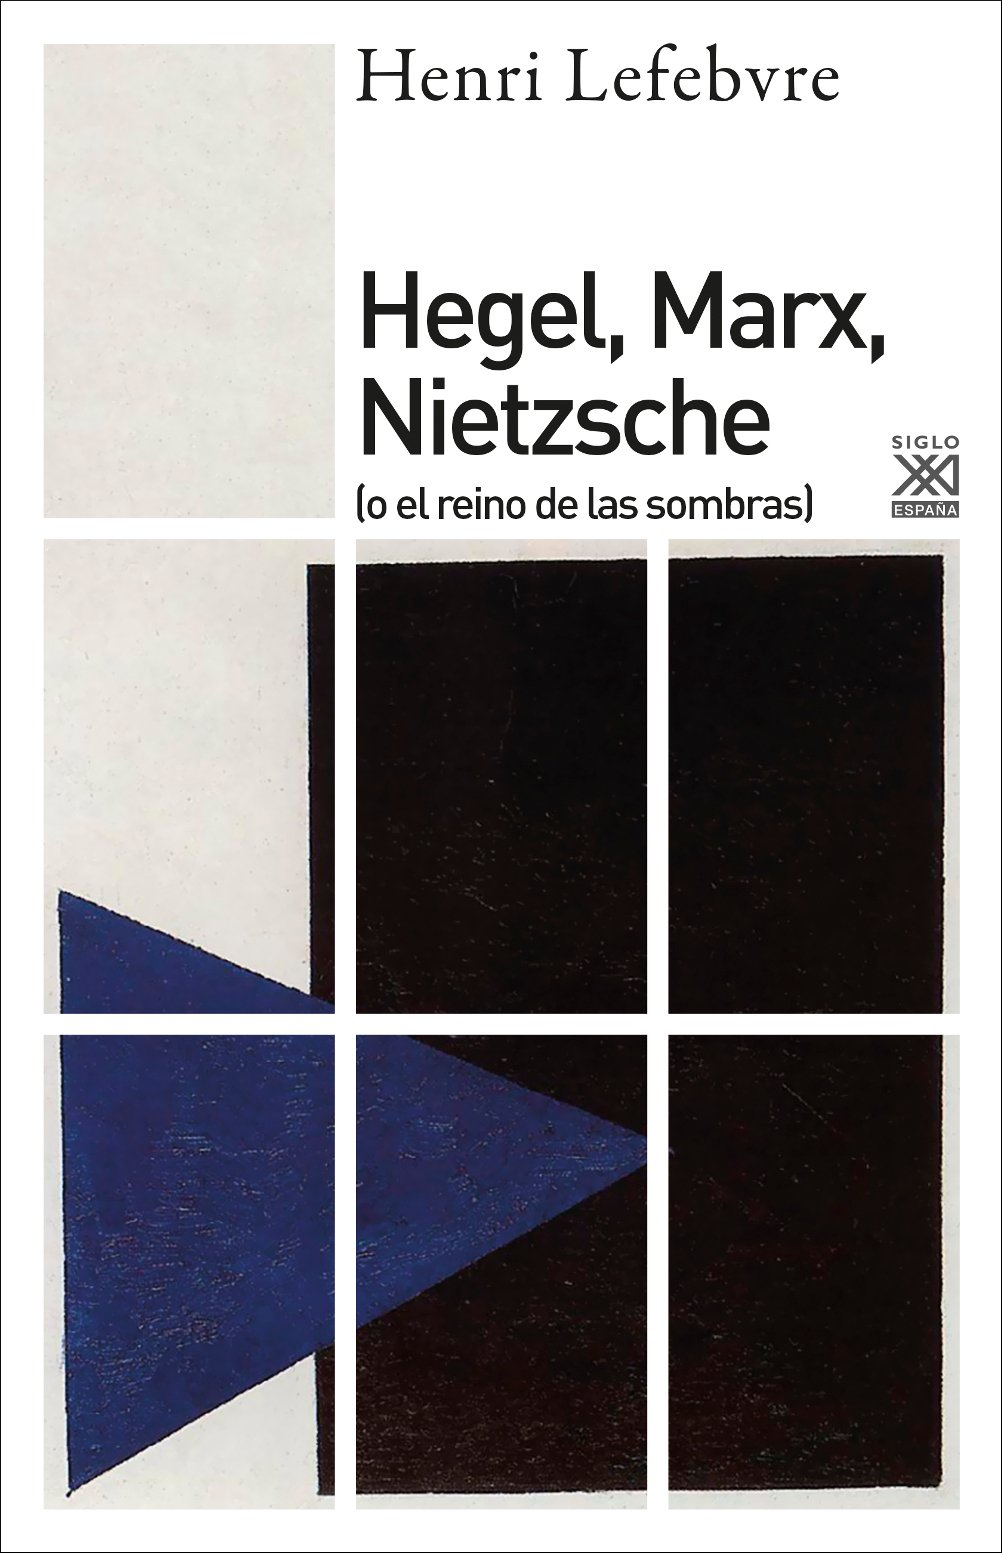 Hegel, Marx, Nietzsche: 1222 Siglo XXI de España General: Amazon.es: Lefebvre, Henri, Armiño, Mauro: Libros